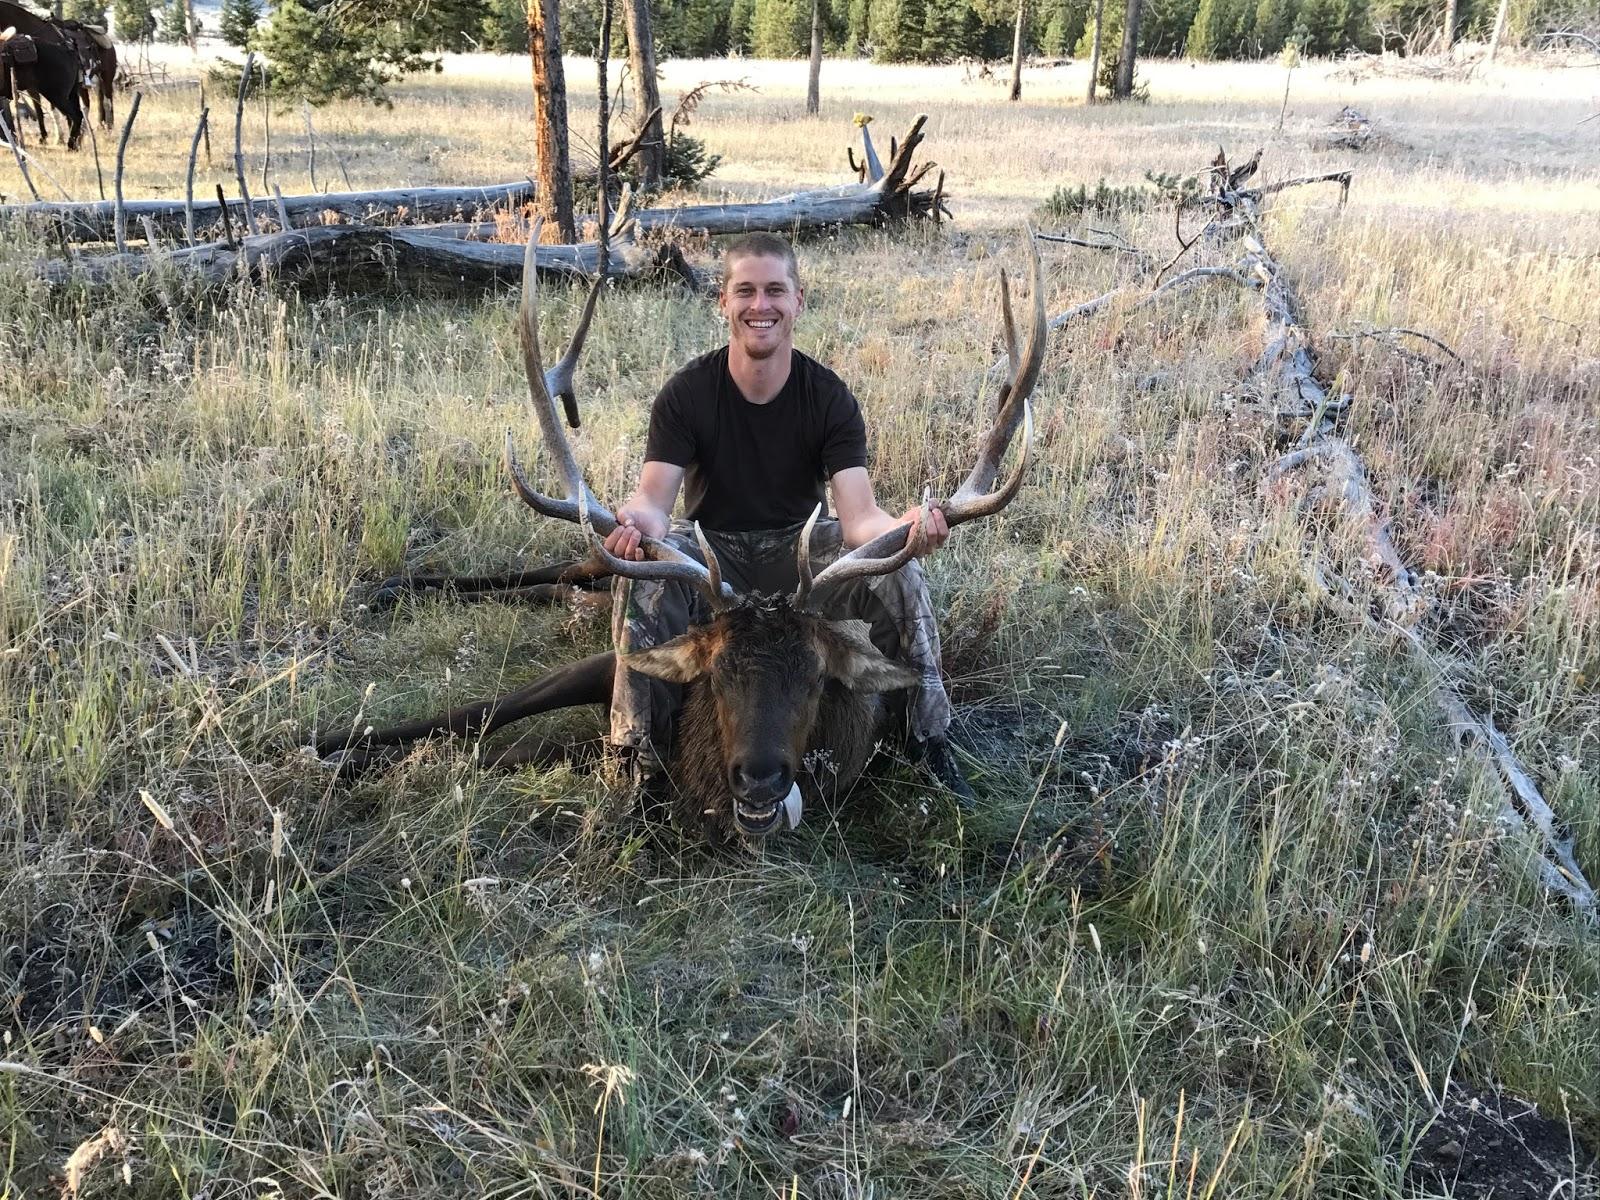 Field Staffer Drew Tvrdik - September, 2017  Montana, Rifle